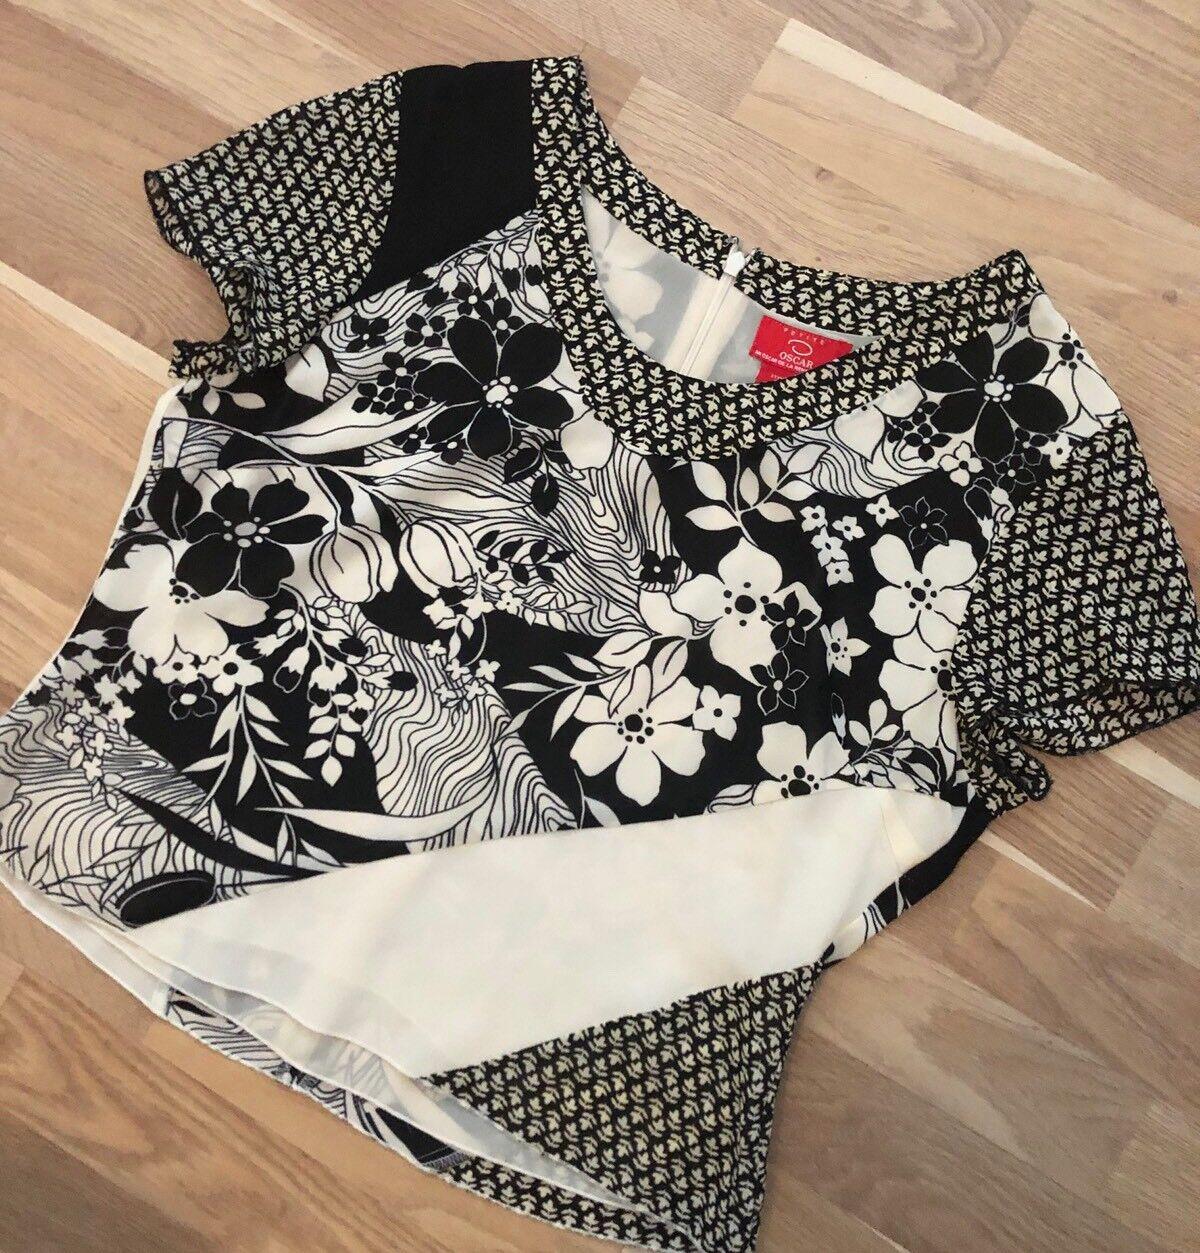 Oscar De La Renta Damen Kleid Kombination Gr Gr Gr 40  2 Teile | Offizielle  | Hohe Qualität Und Geringen Overhead  b9f19e